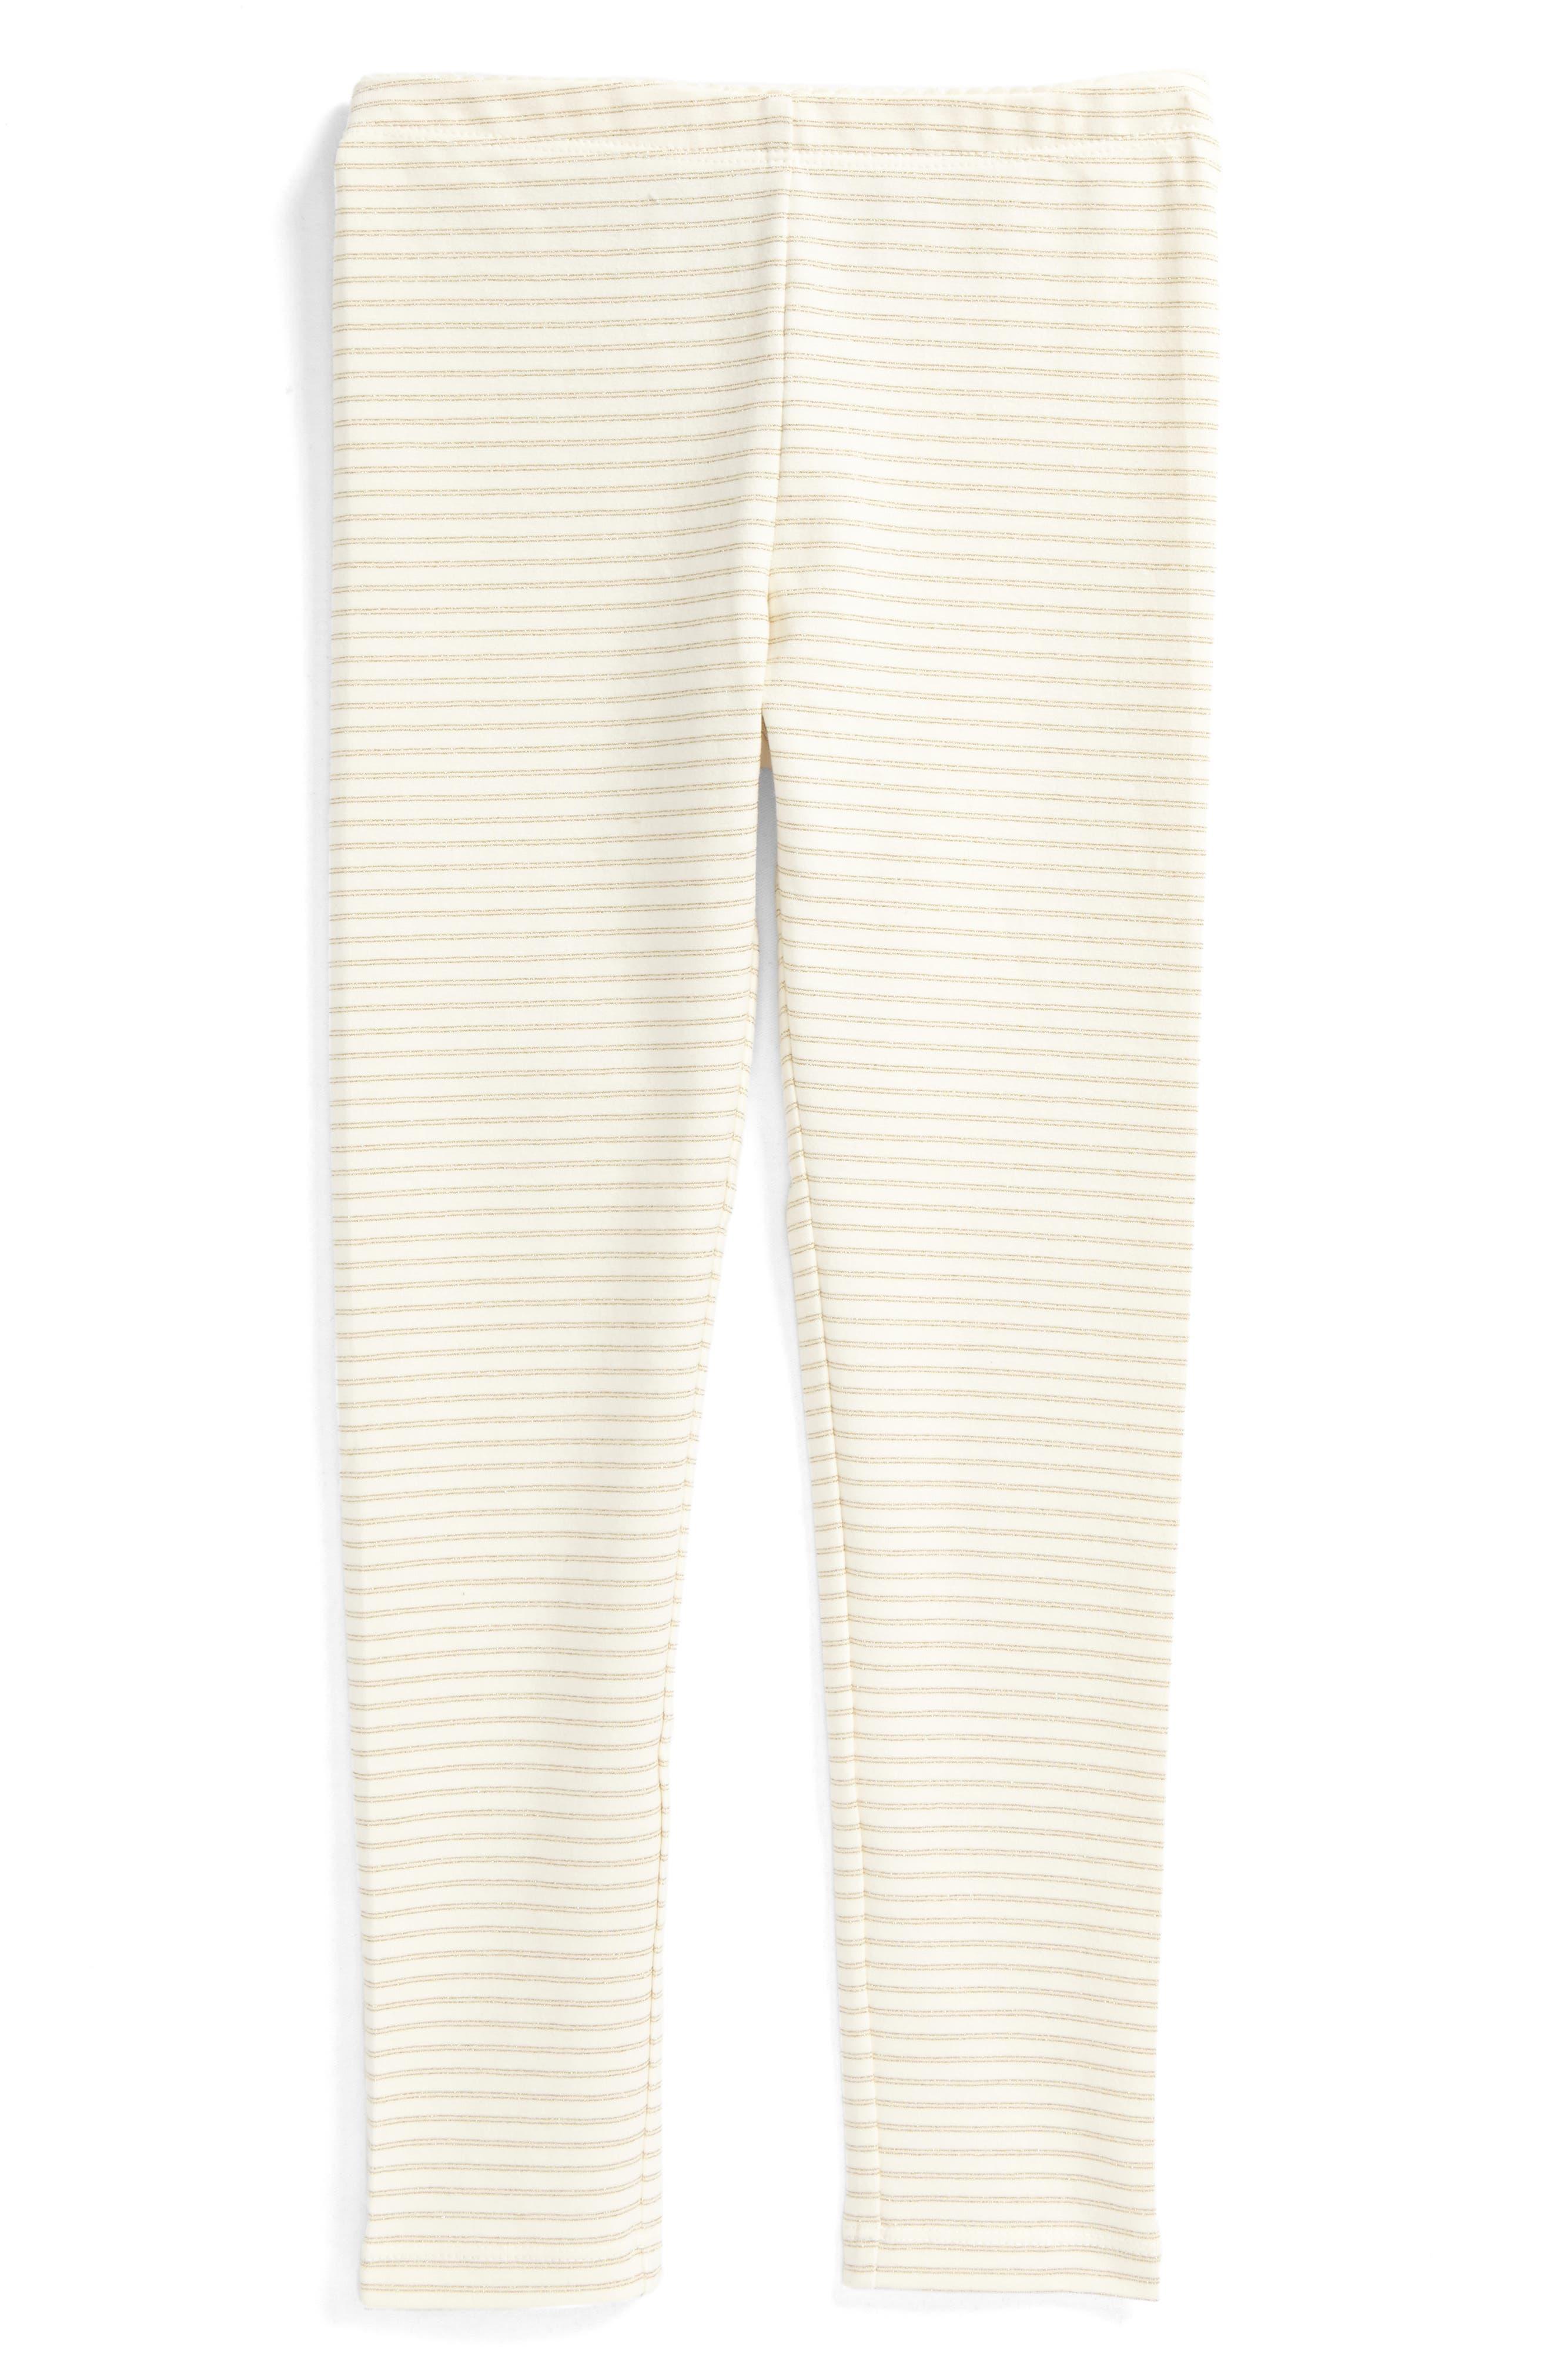 Alternate Image 1 Selected - Tea Collection Sparkle Stripe Leggings (Toddler Girls, Little Girls & Big Girls)